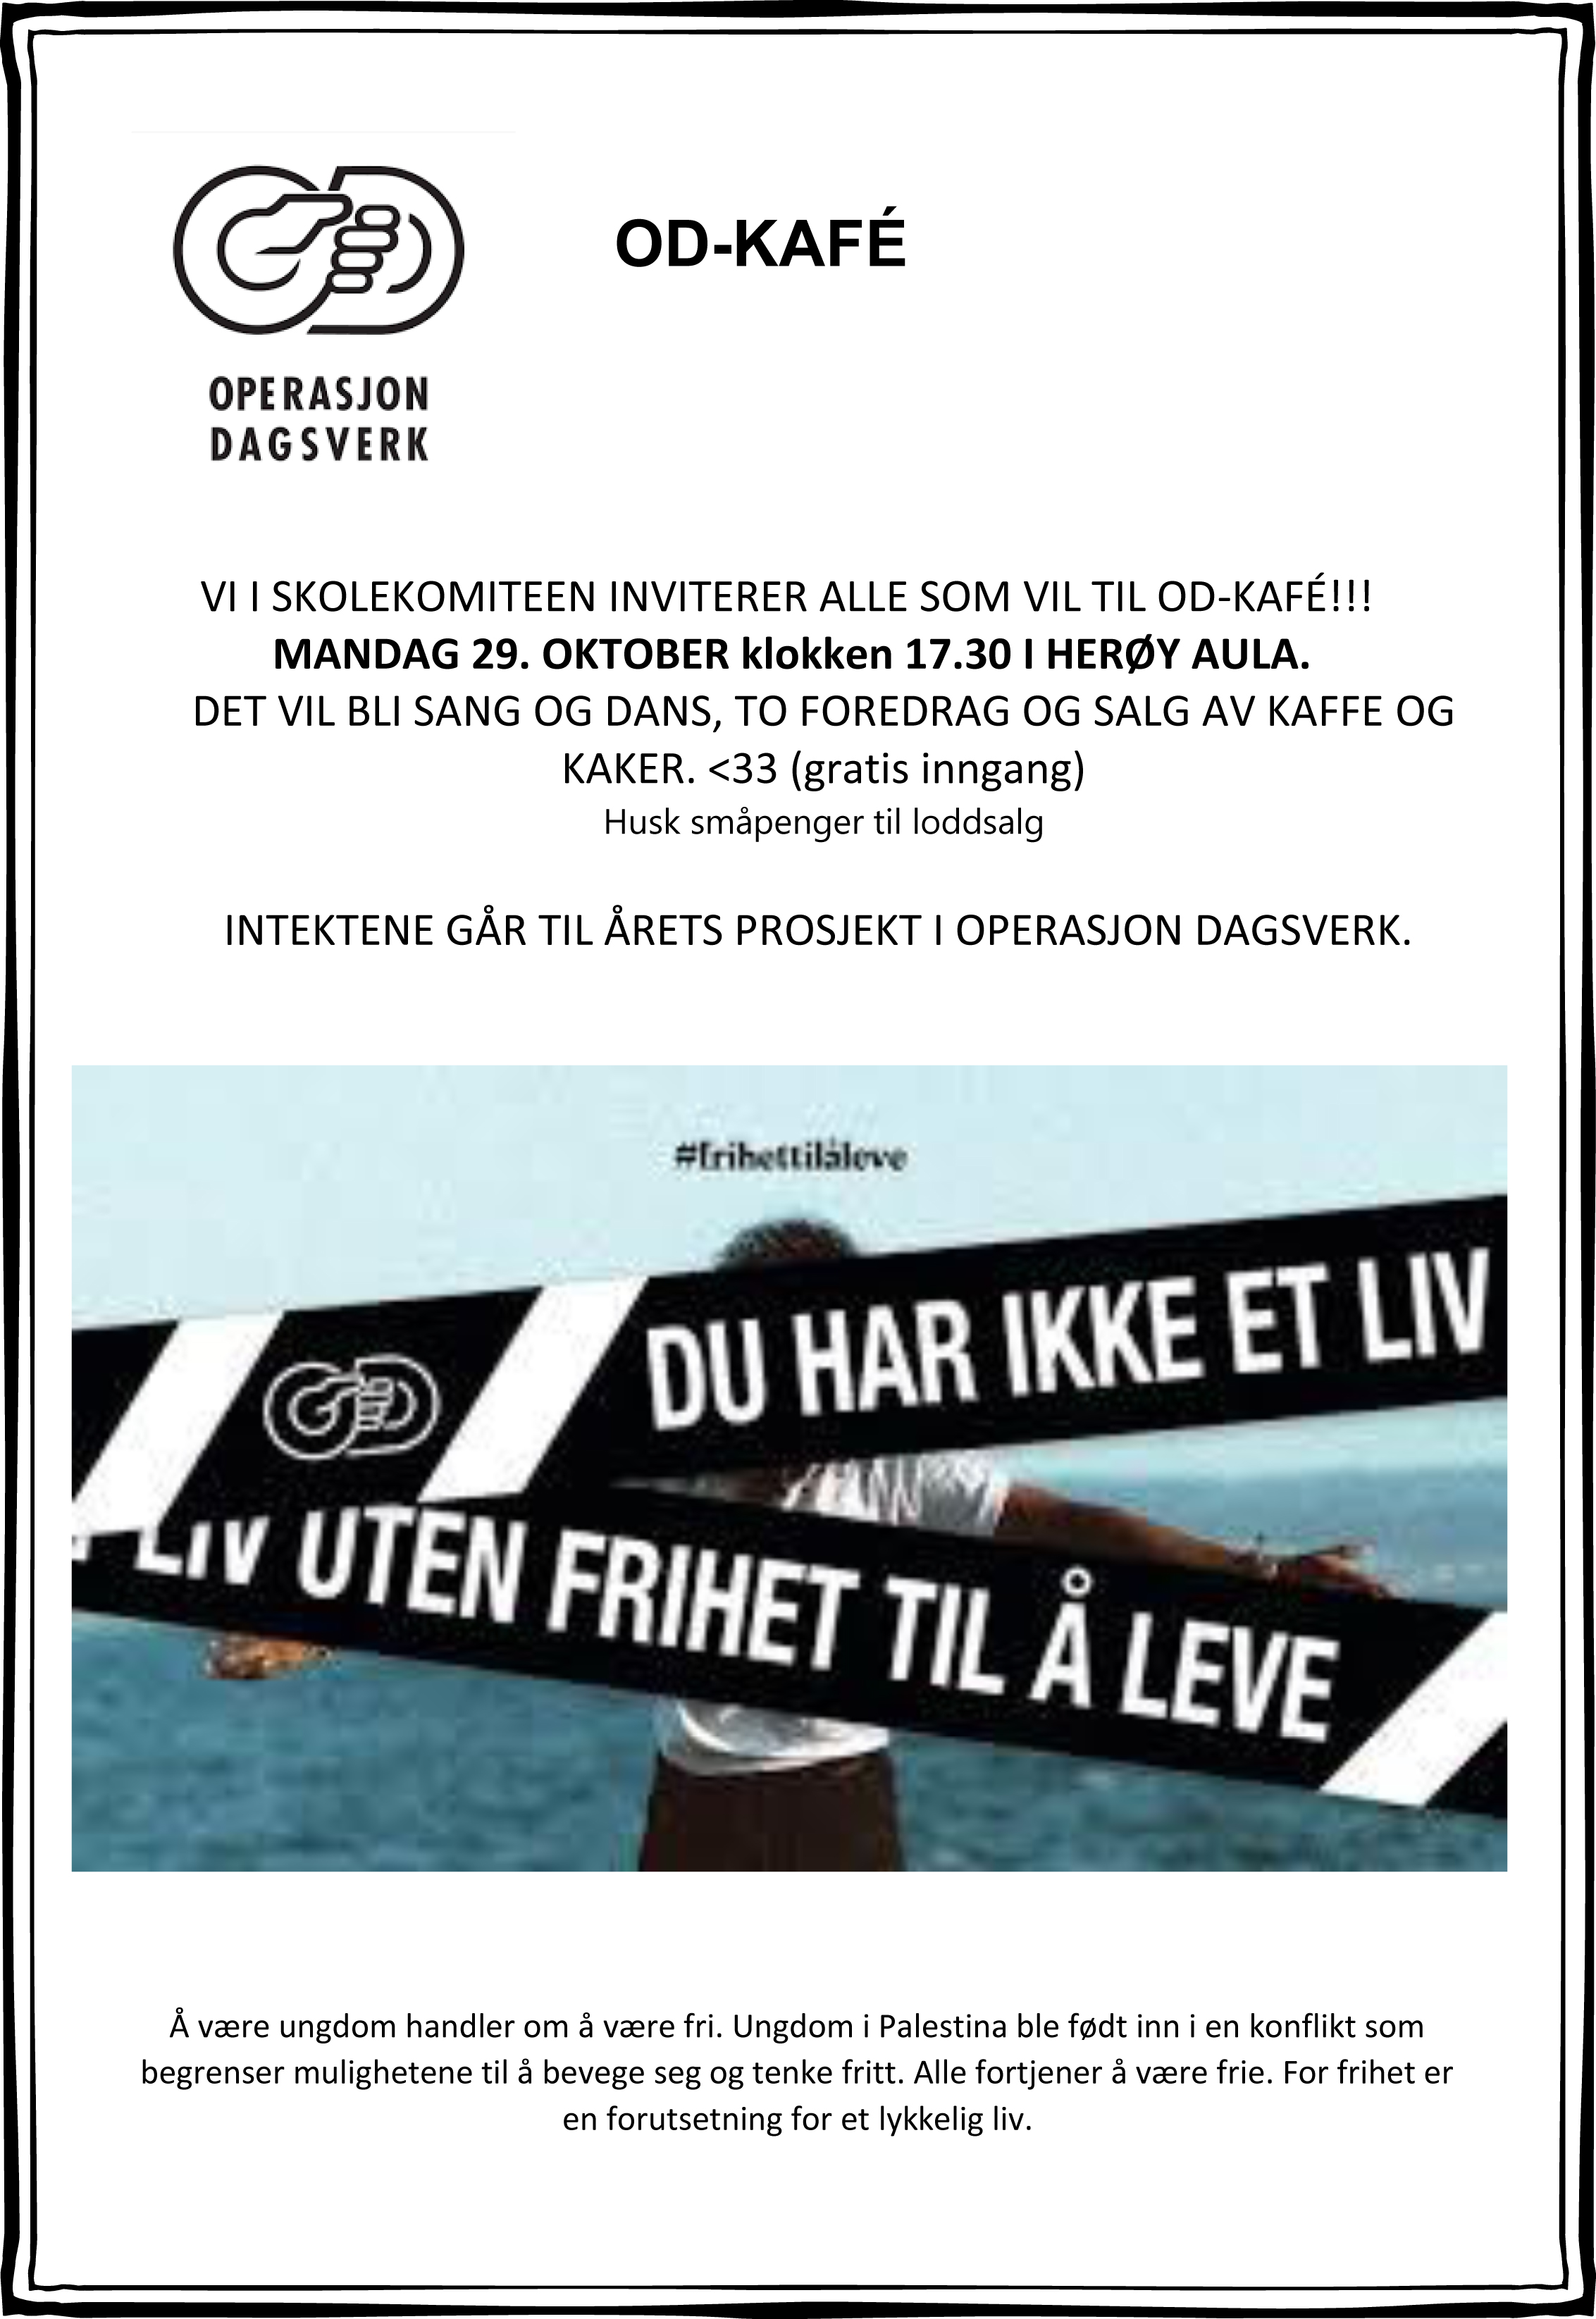 Tora Olsen Skagen